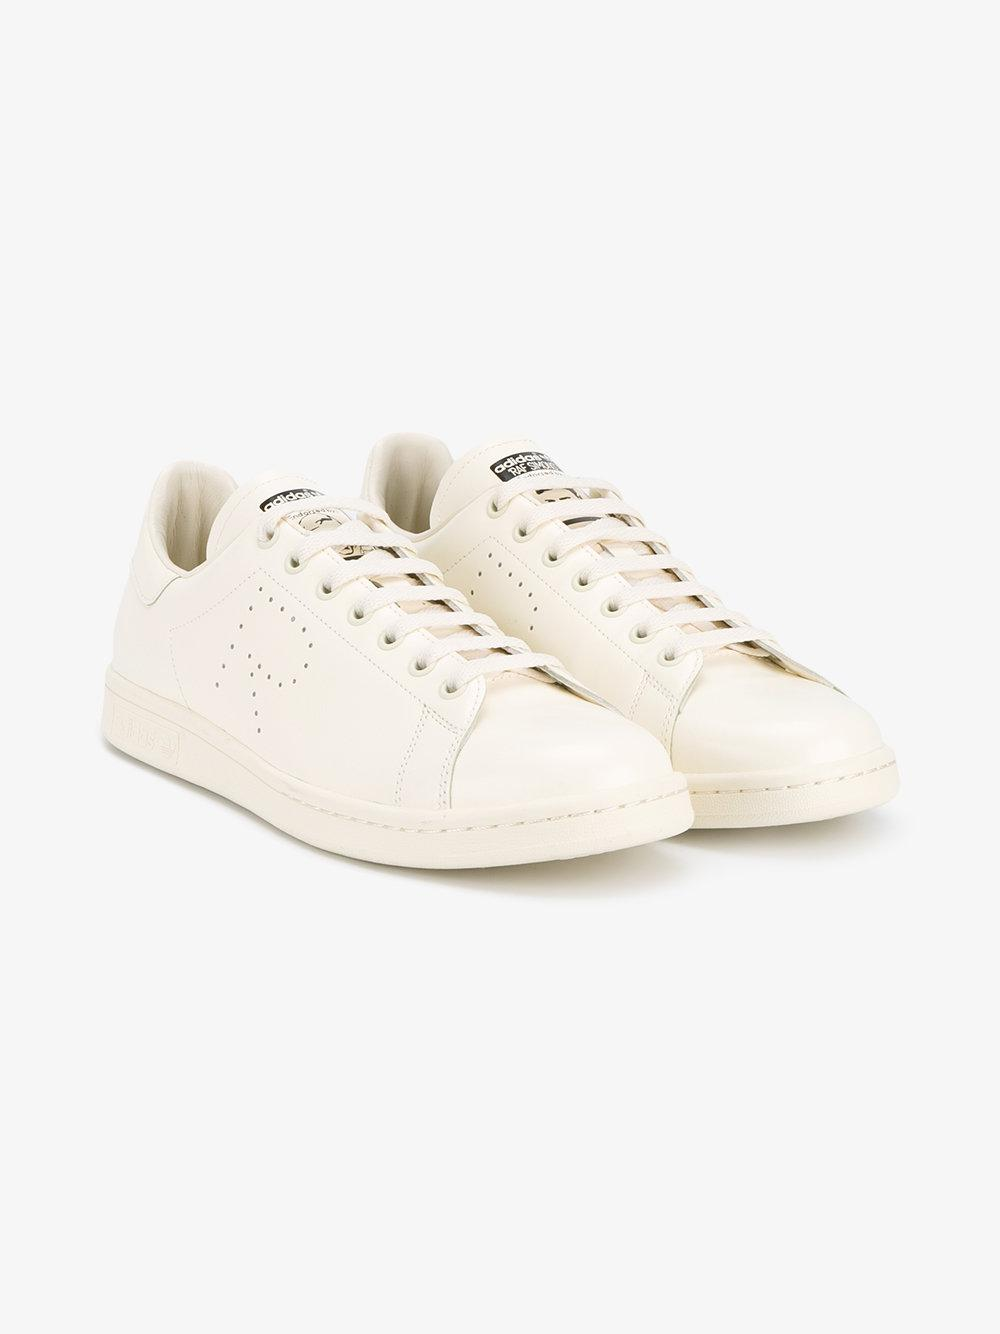 adidas stan smith formatori in cuoio bianco